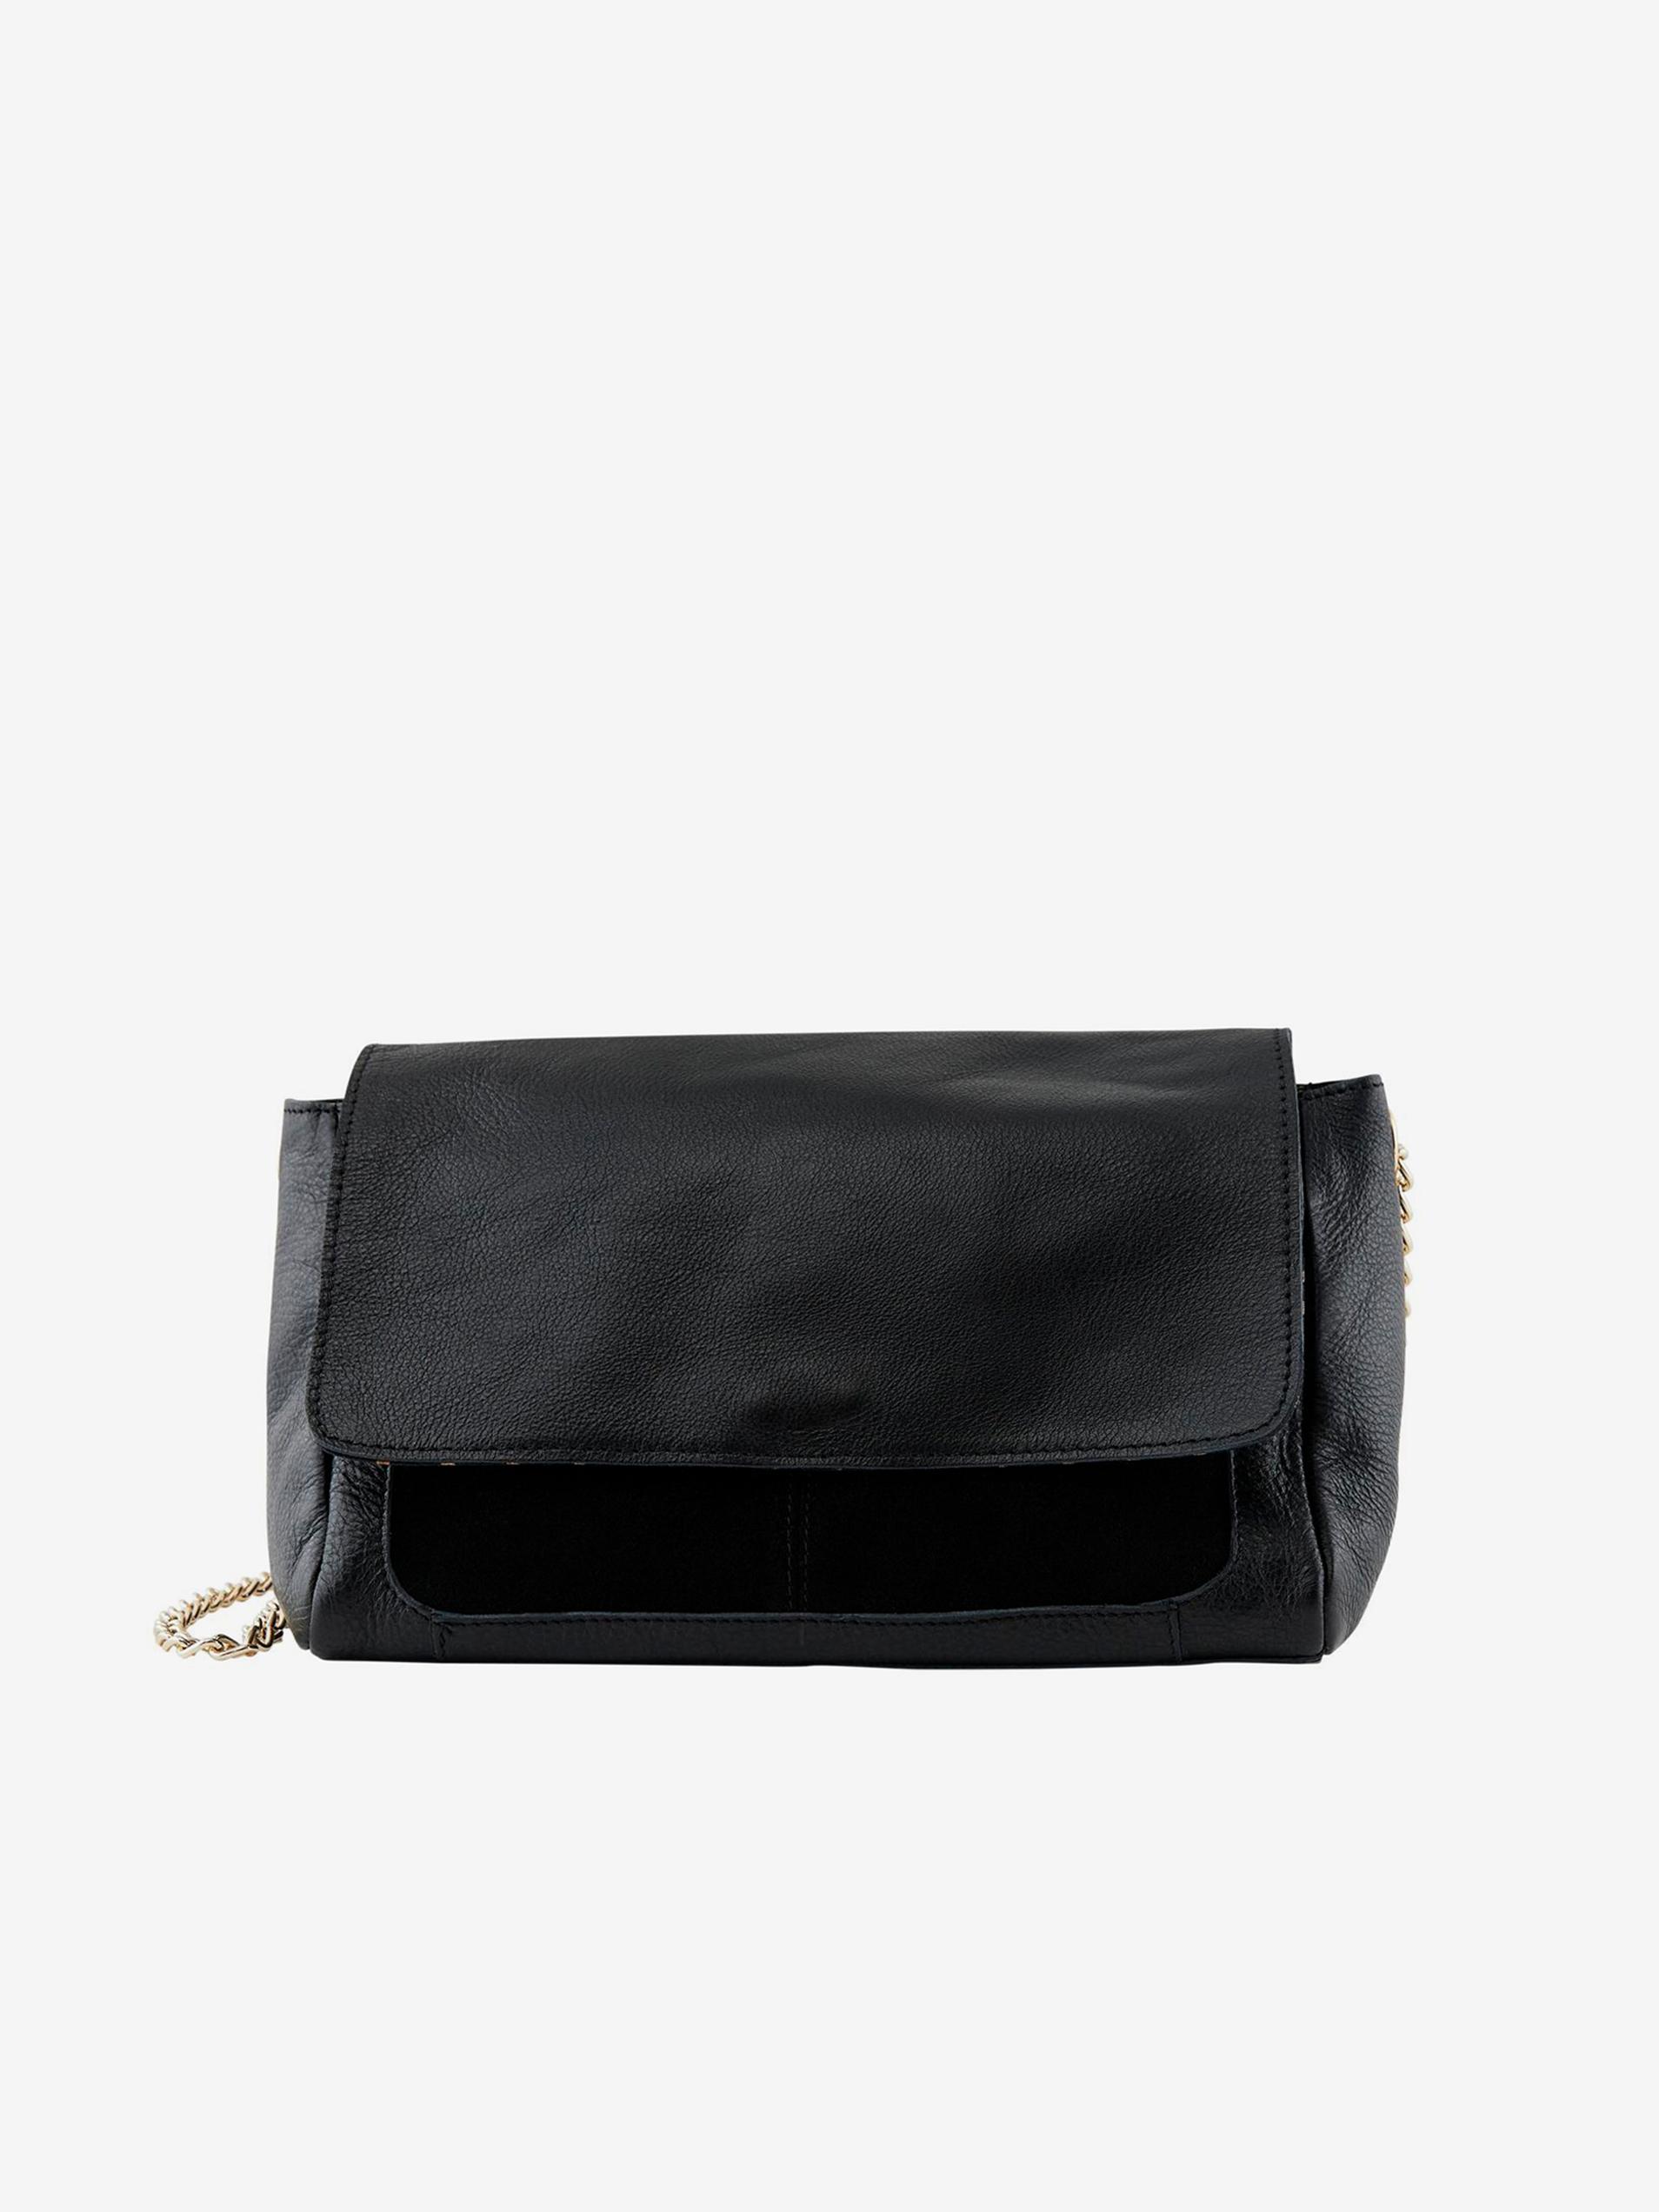 Pieces black leather crossbody handbag Gunna